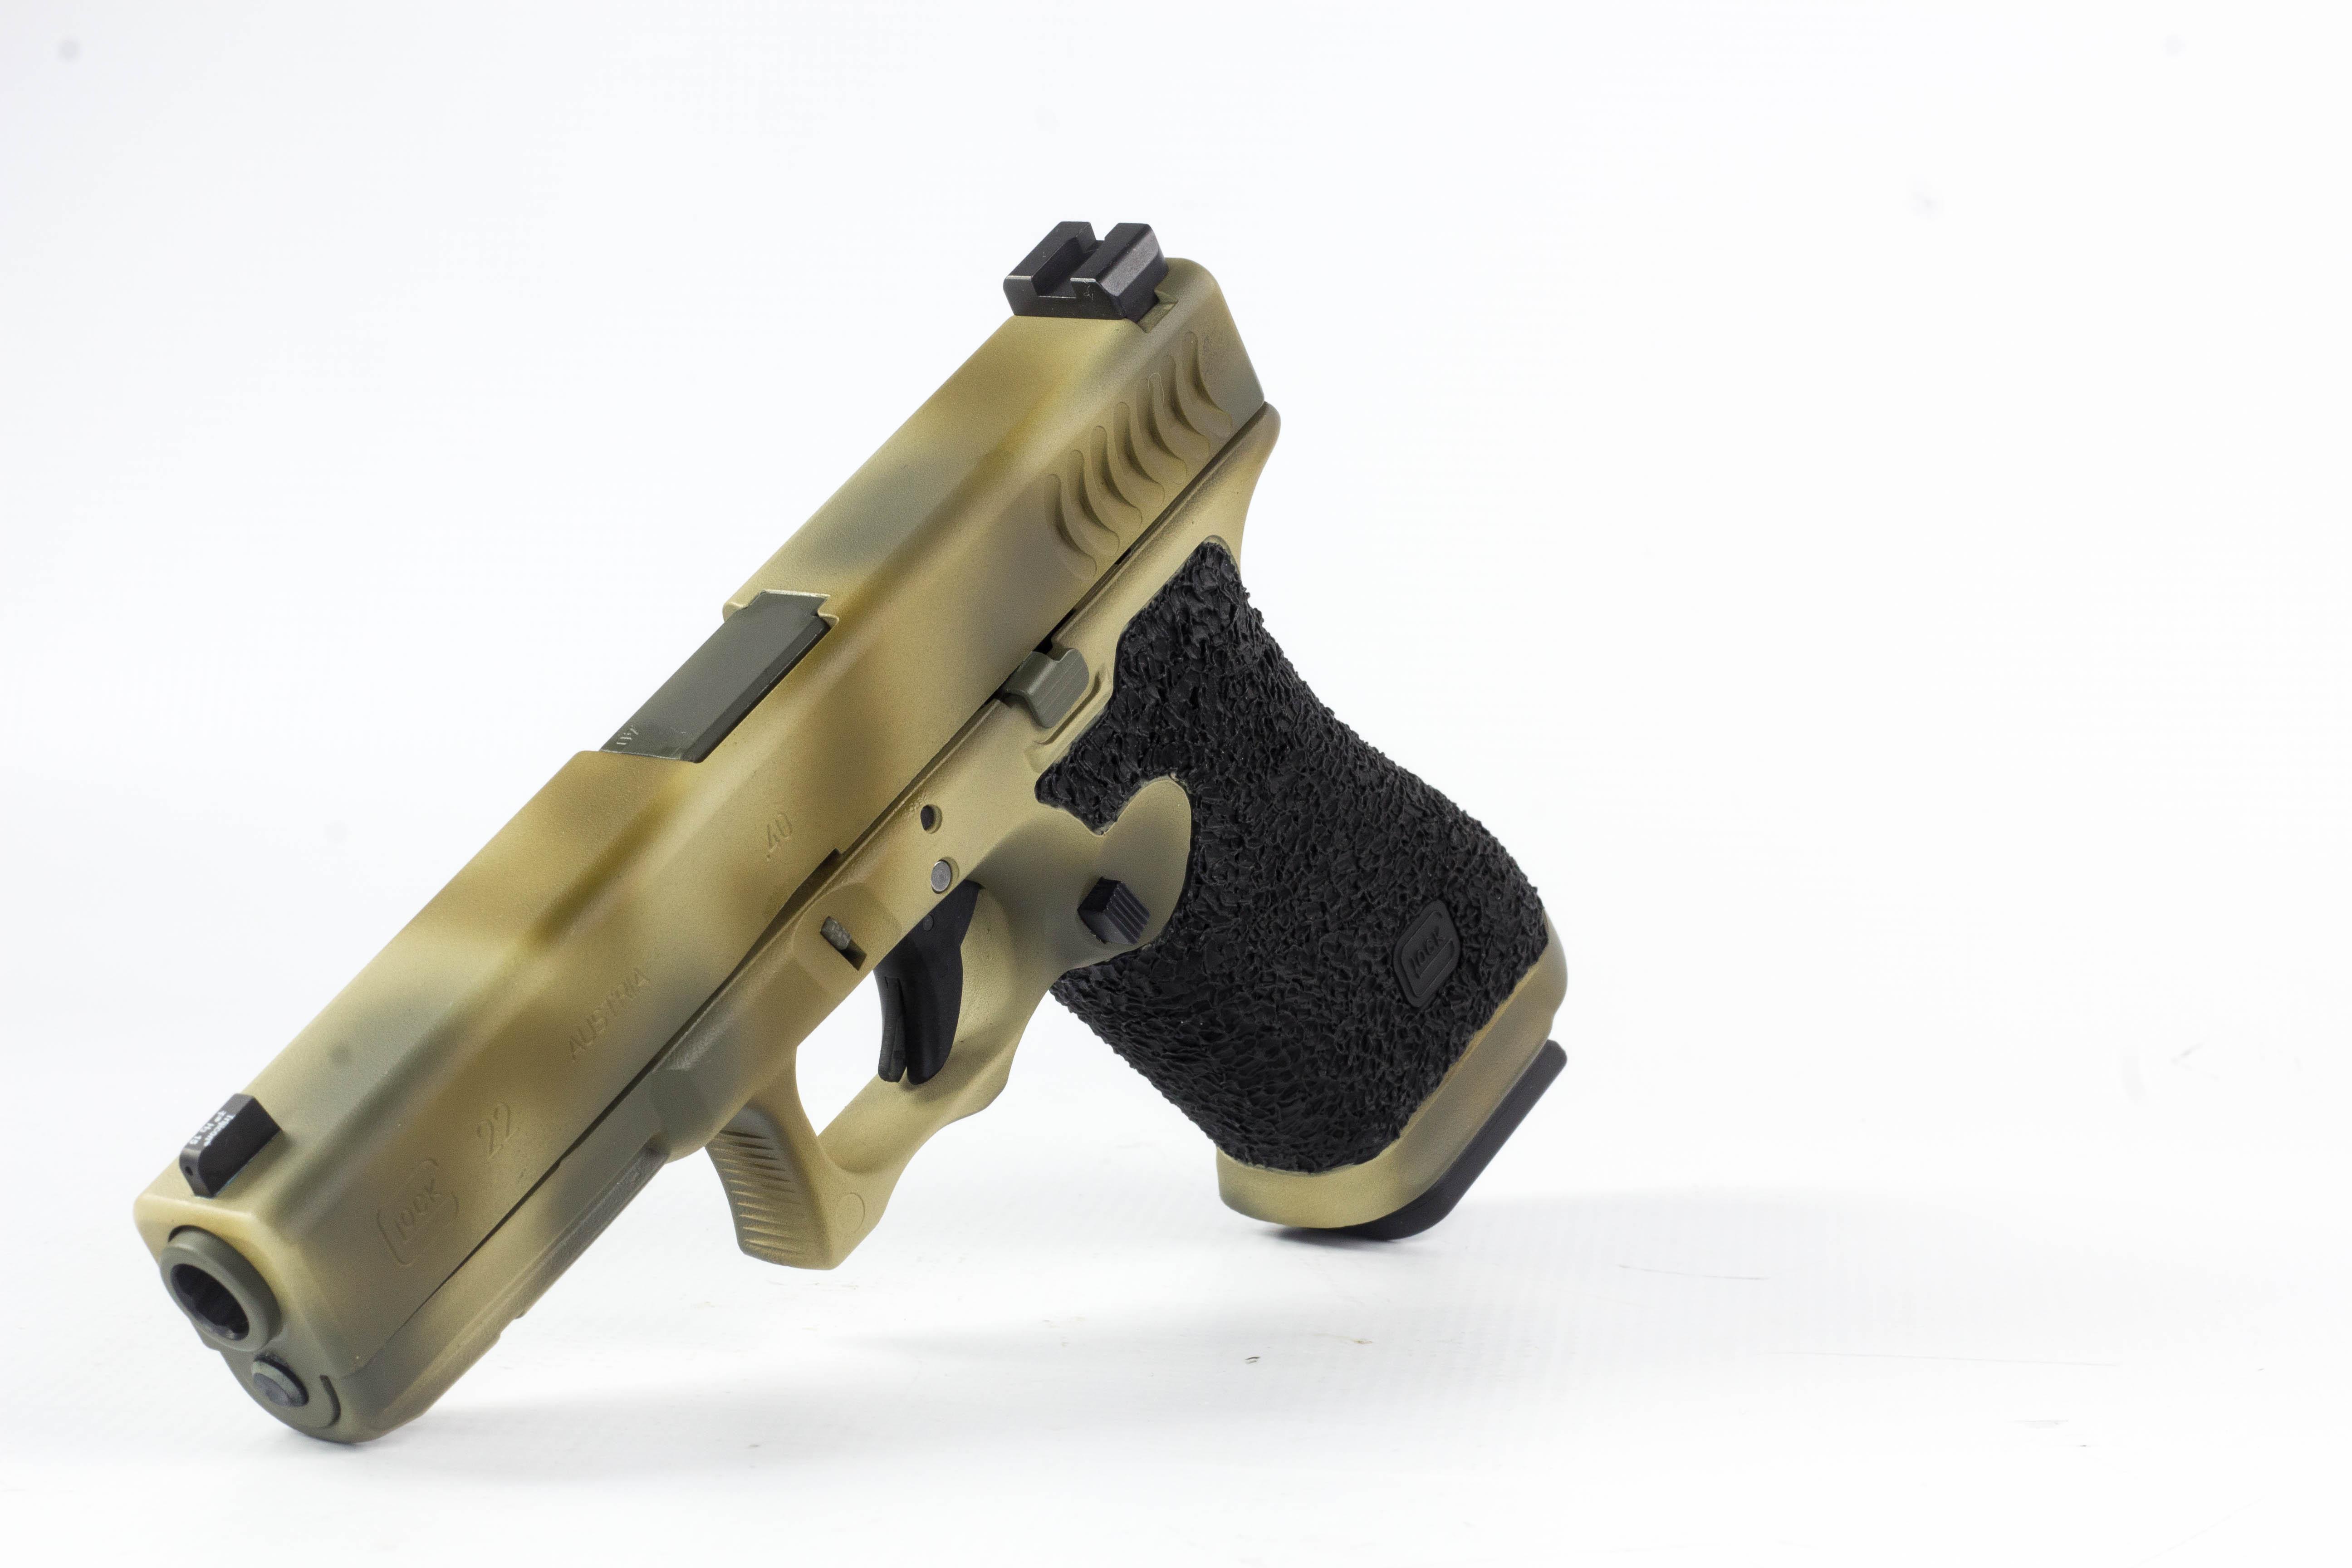 Camouflage Cerakote Pistol